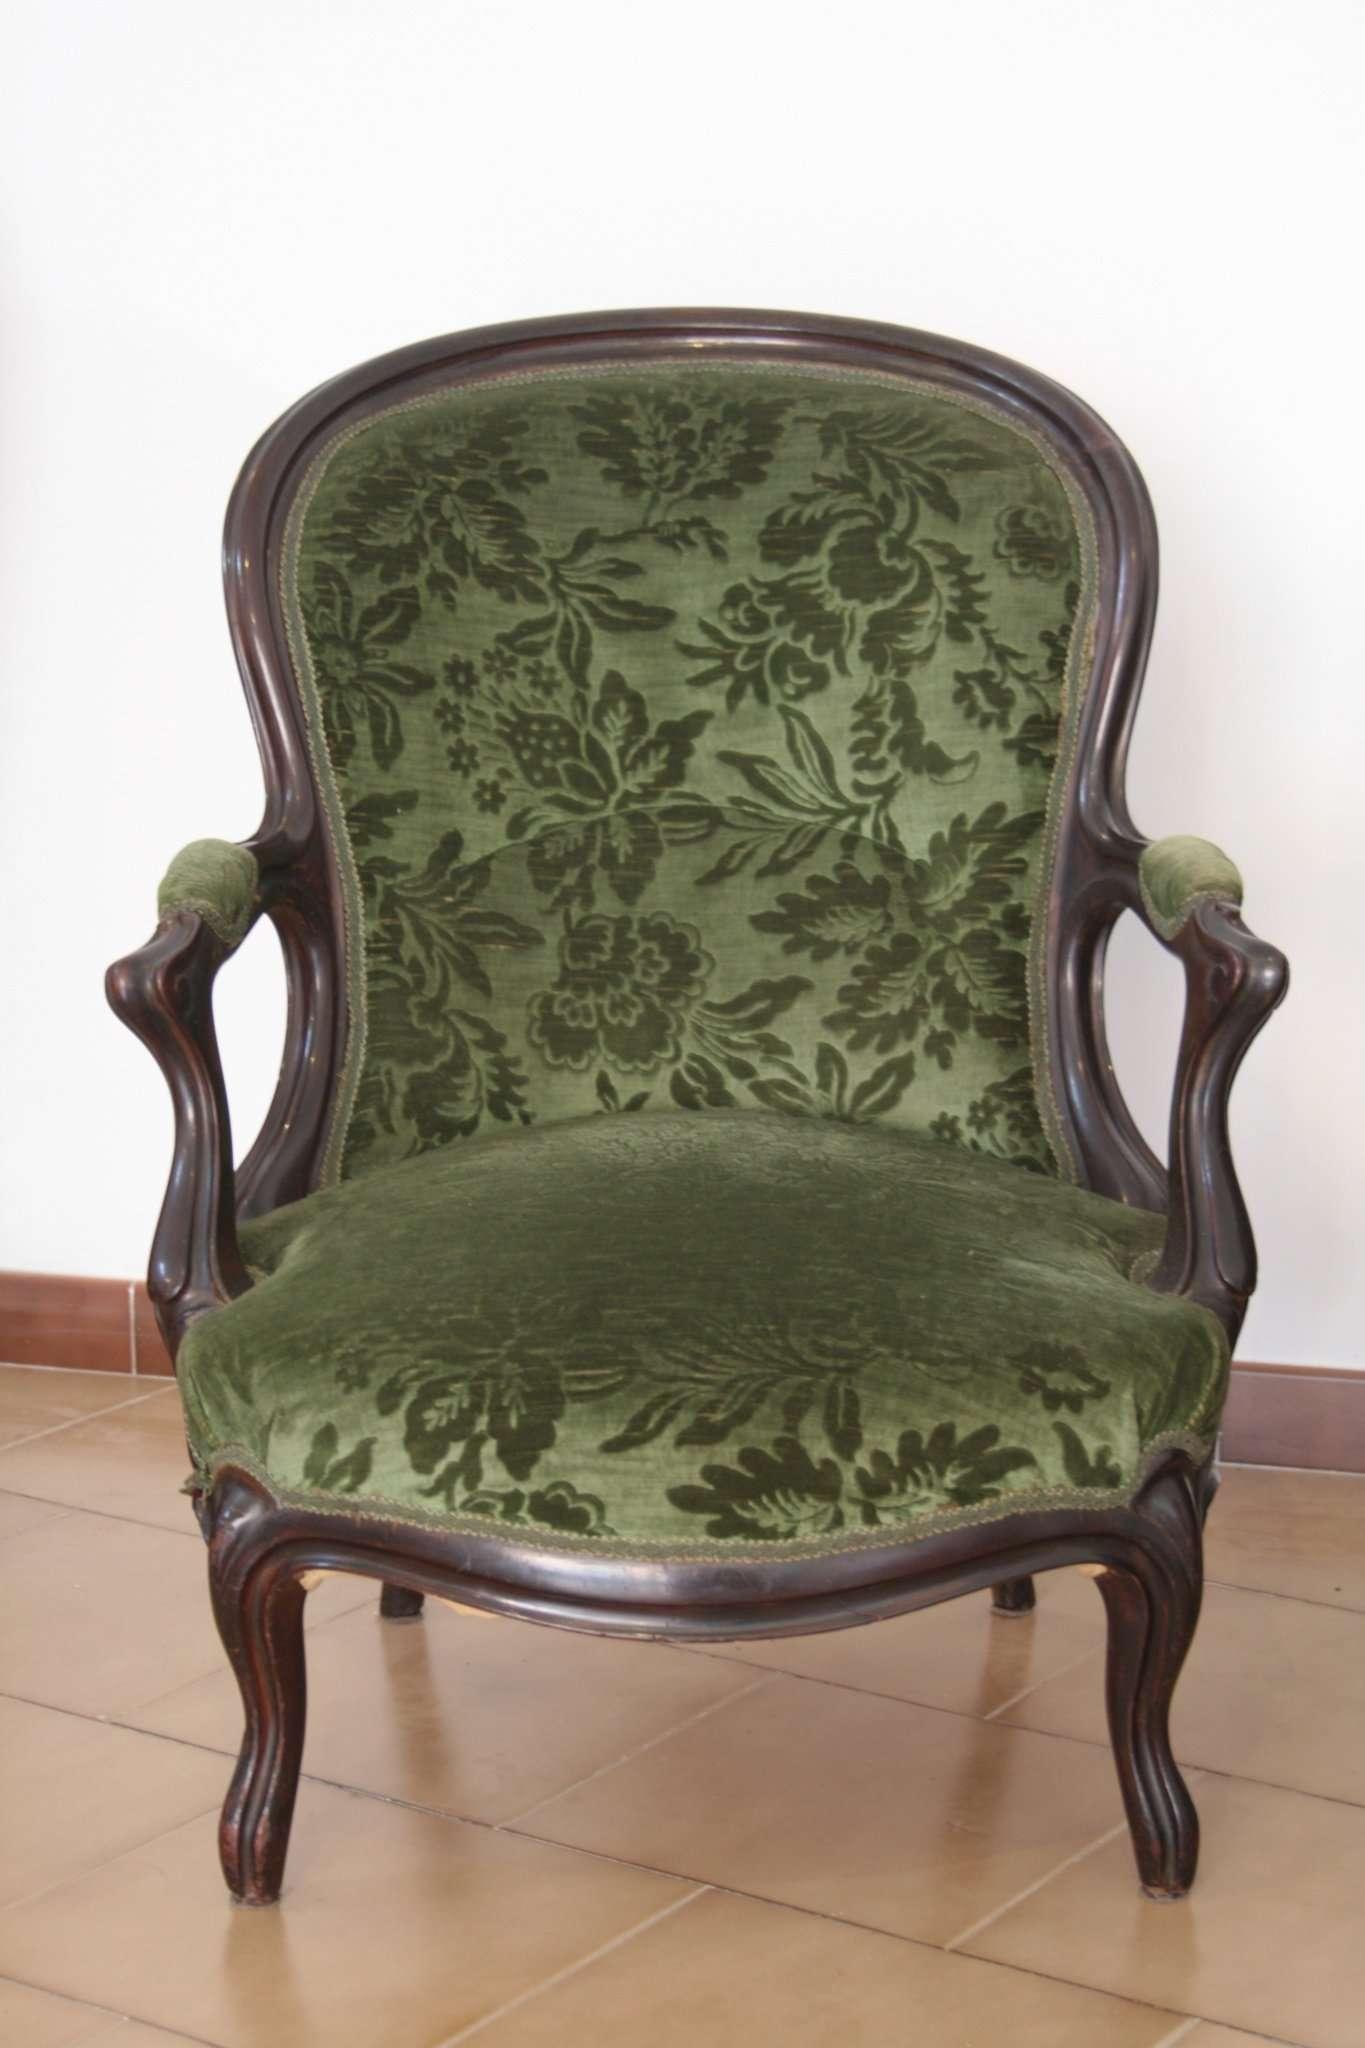 Salottino luigi filippo francese divano e due poltrone 1830 1850 francia - Divano luigi filippo quotazione ...